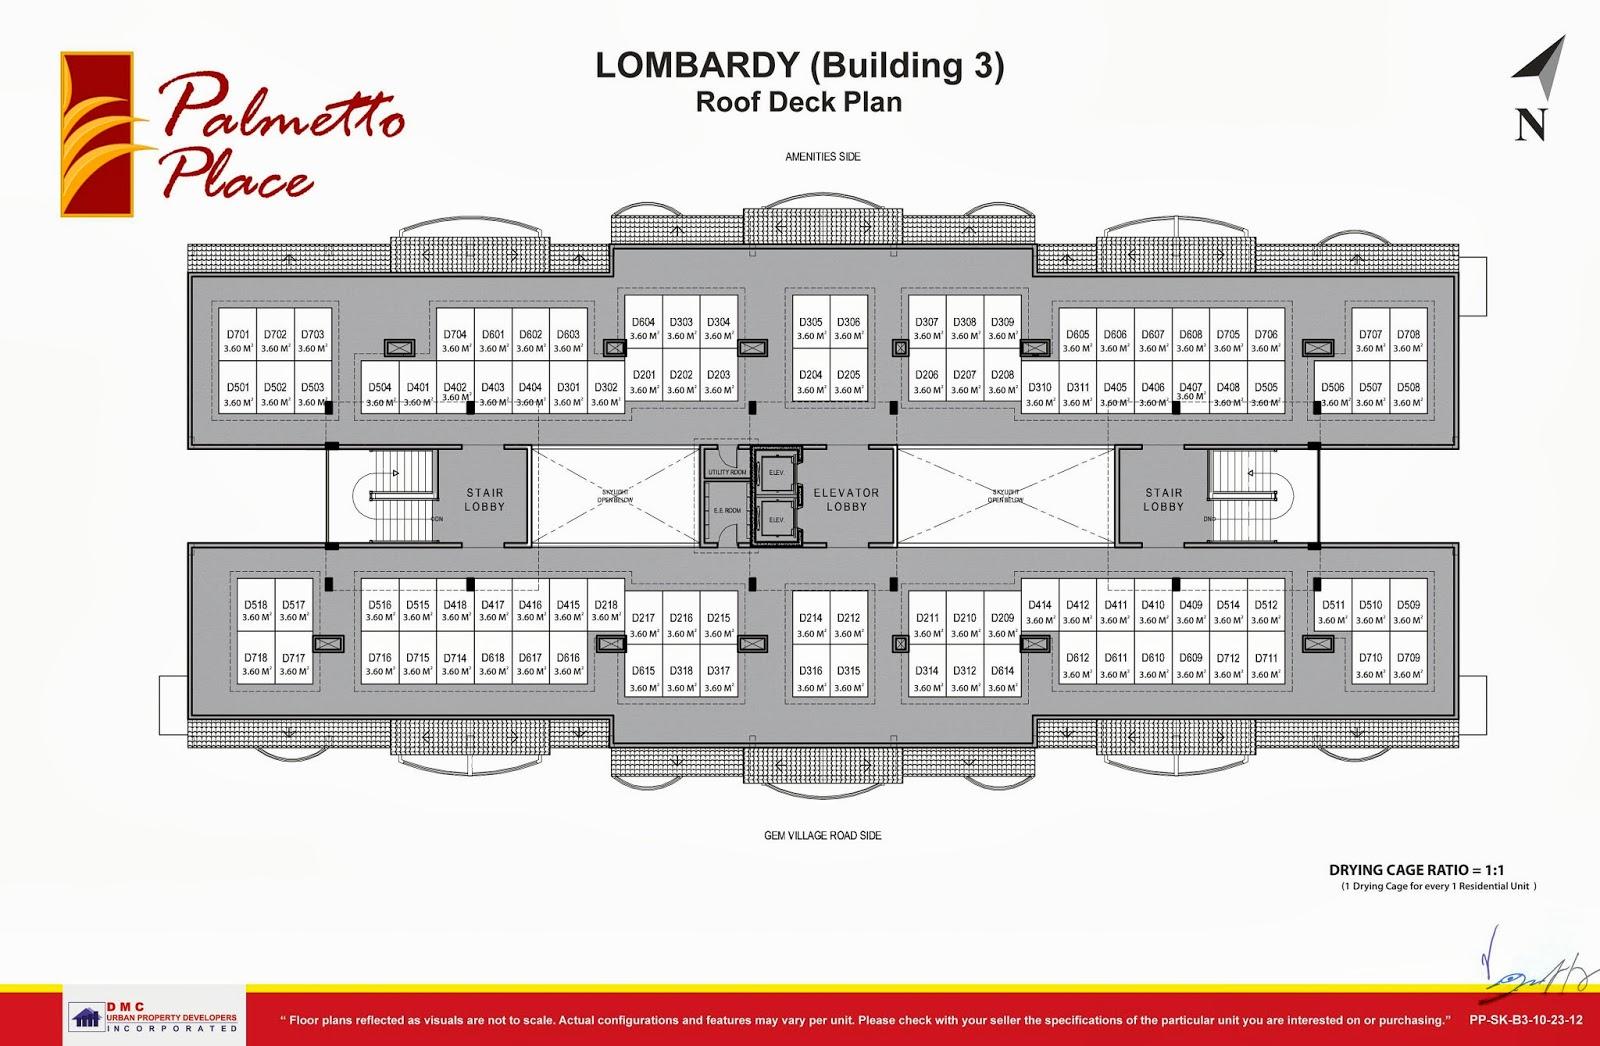 Palmetto Place Condominium, Ma-a, Davao City Roof Deck Floor Plan